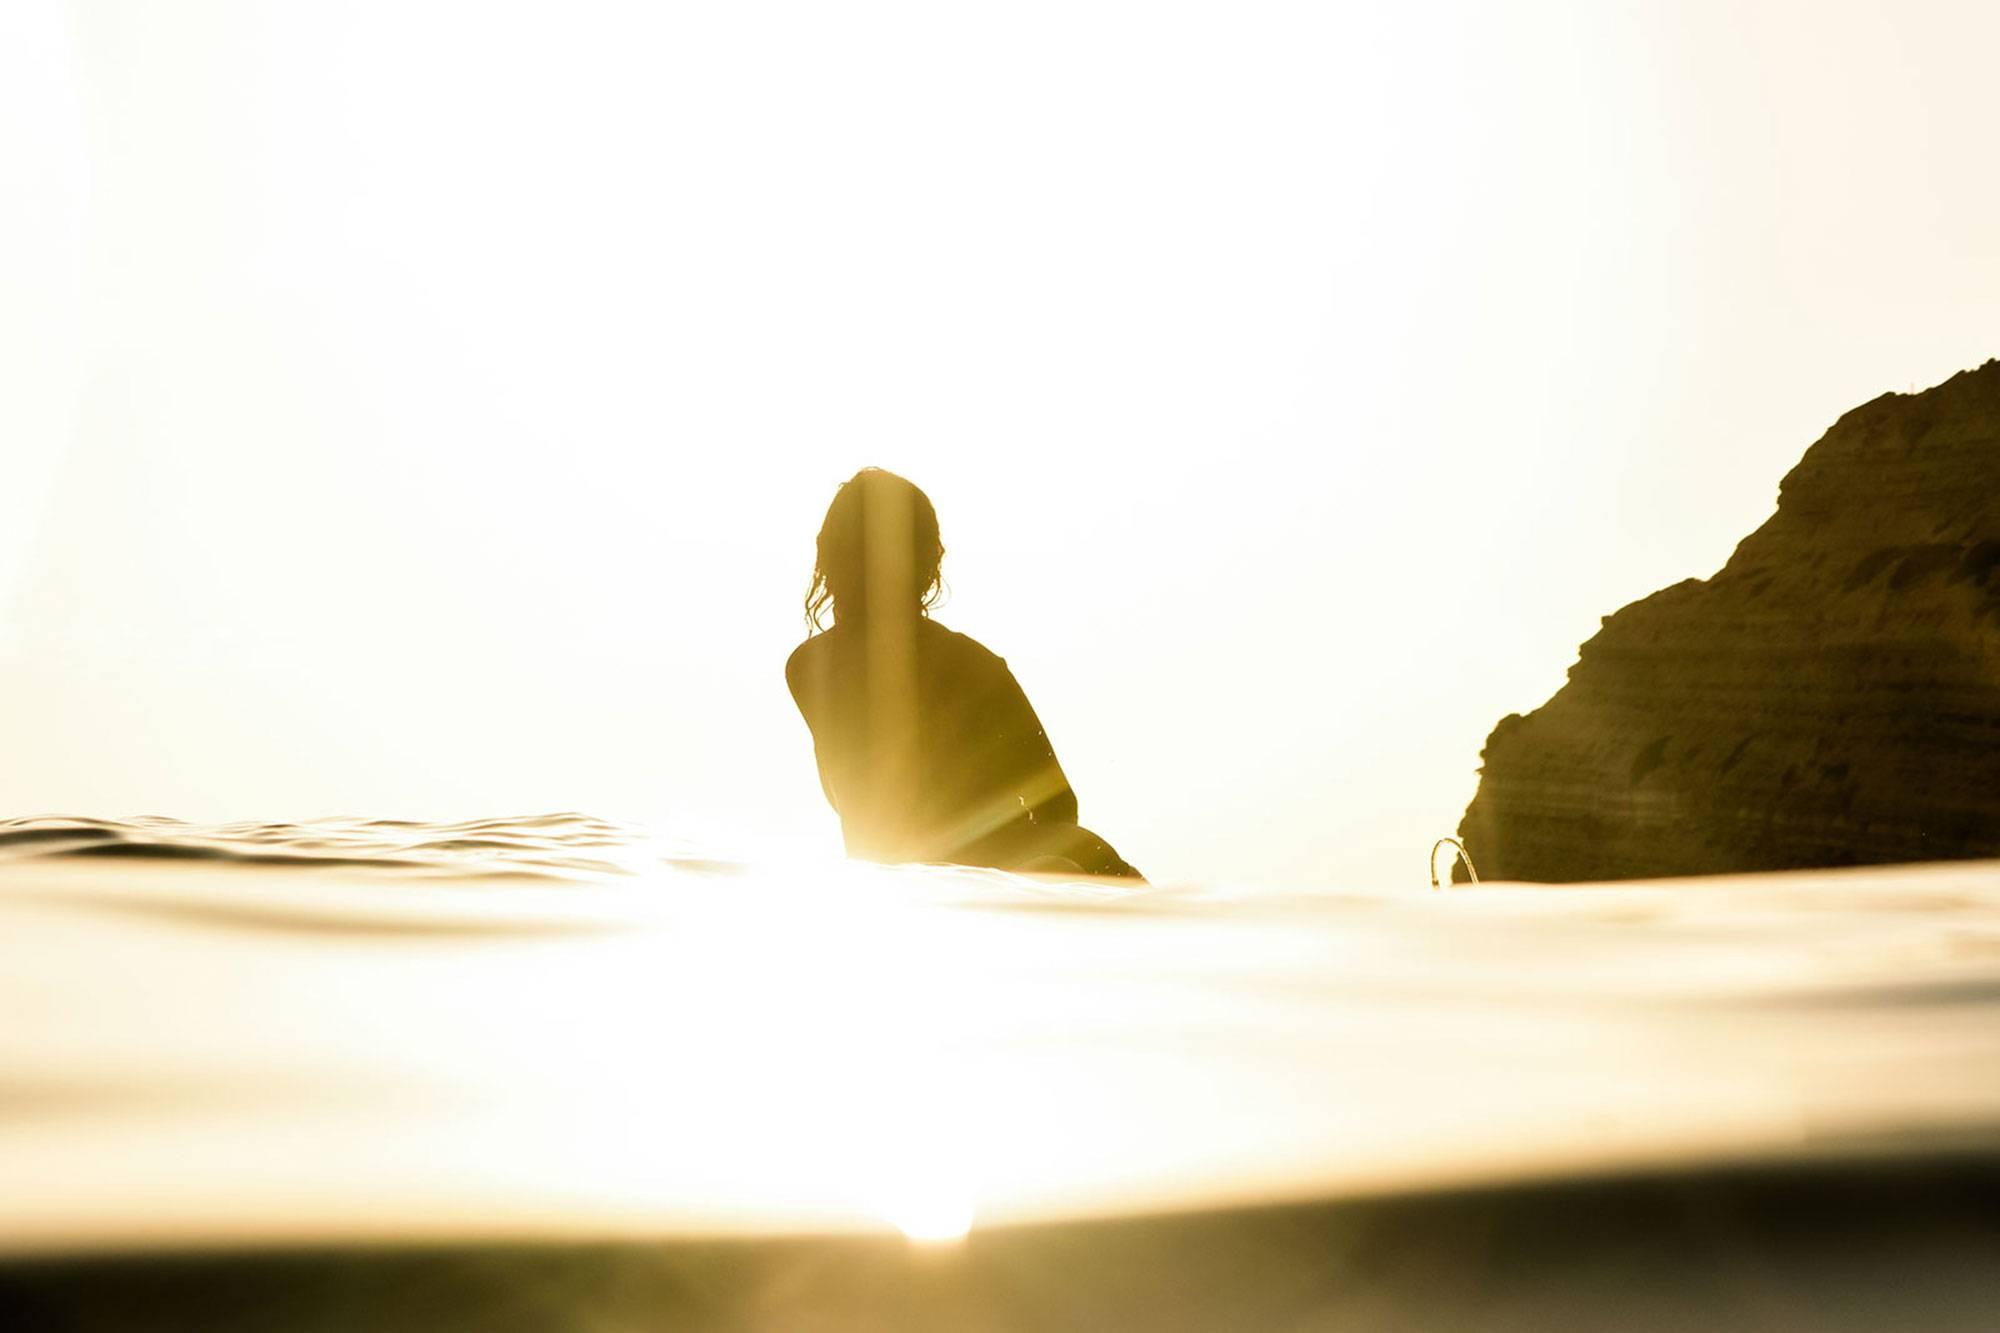 https://www.soulandsurf.com/wp-content/uploads/2021/07/Surf-Mos-Katie-Rae.jpeg